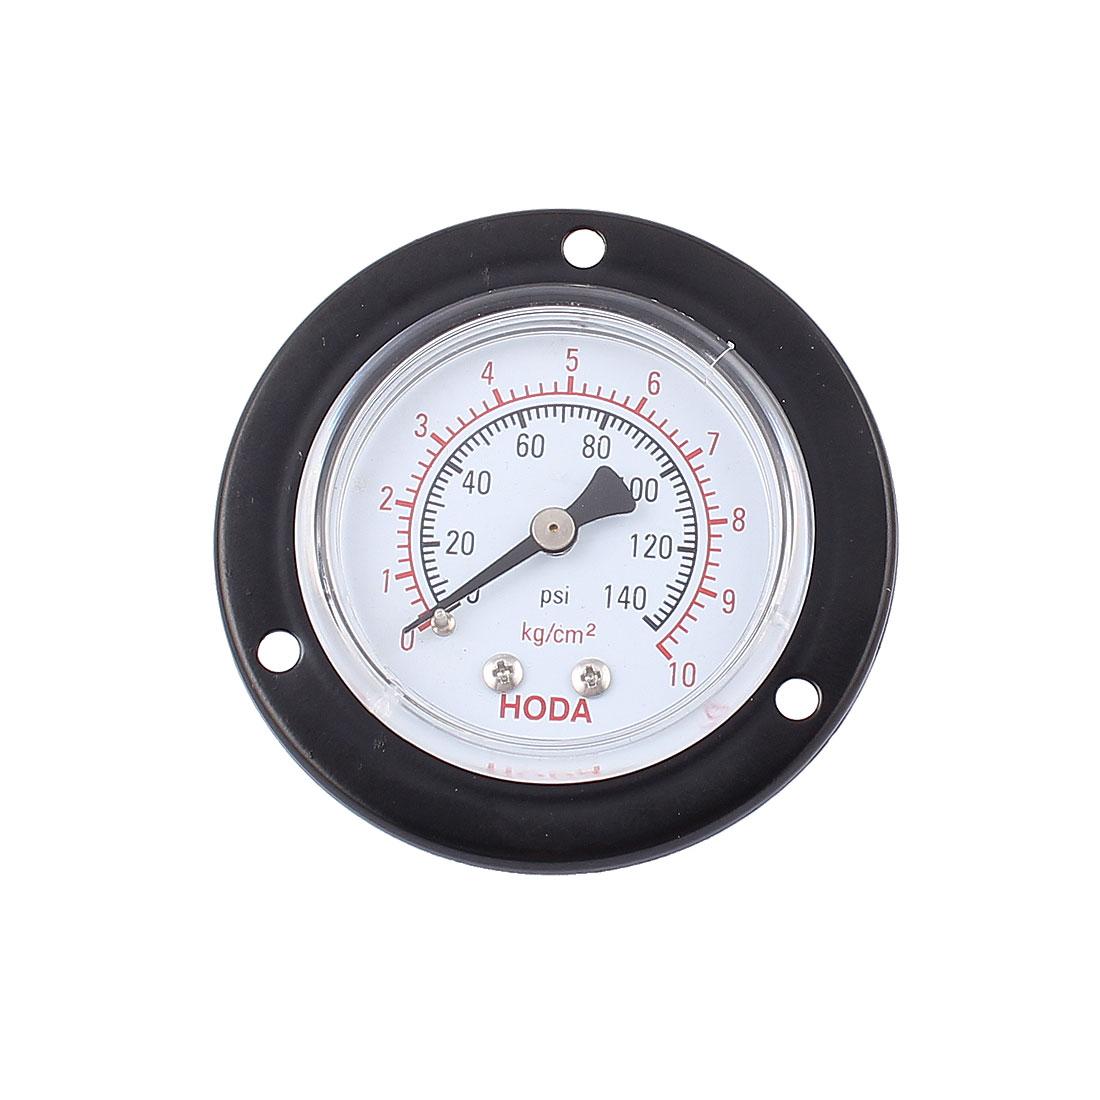 0-140psi 0-10kg/cm2 13mm 1/4PT Thread Dia Dial Air Pressure Gauge